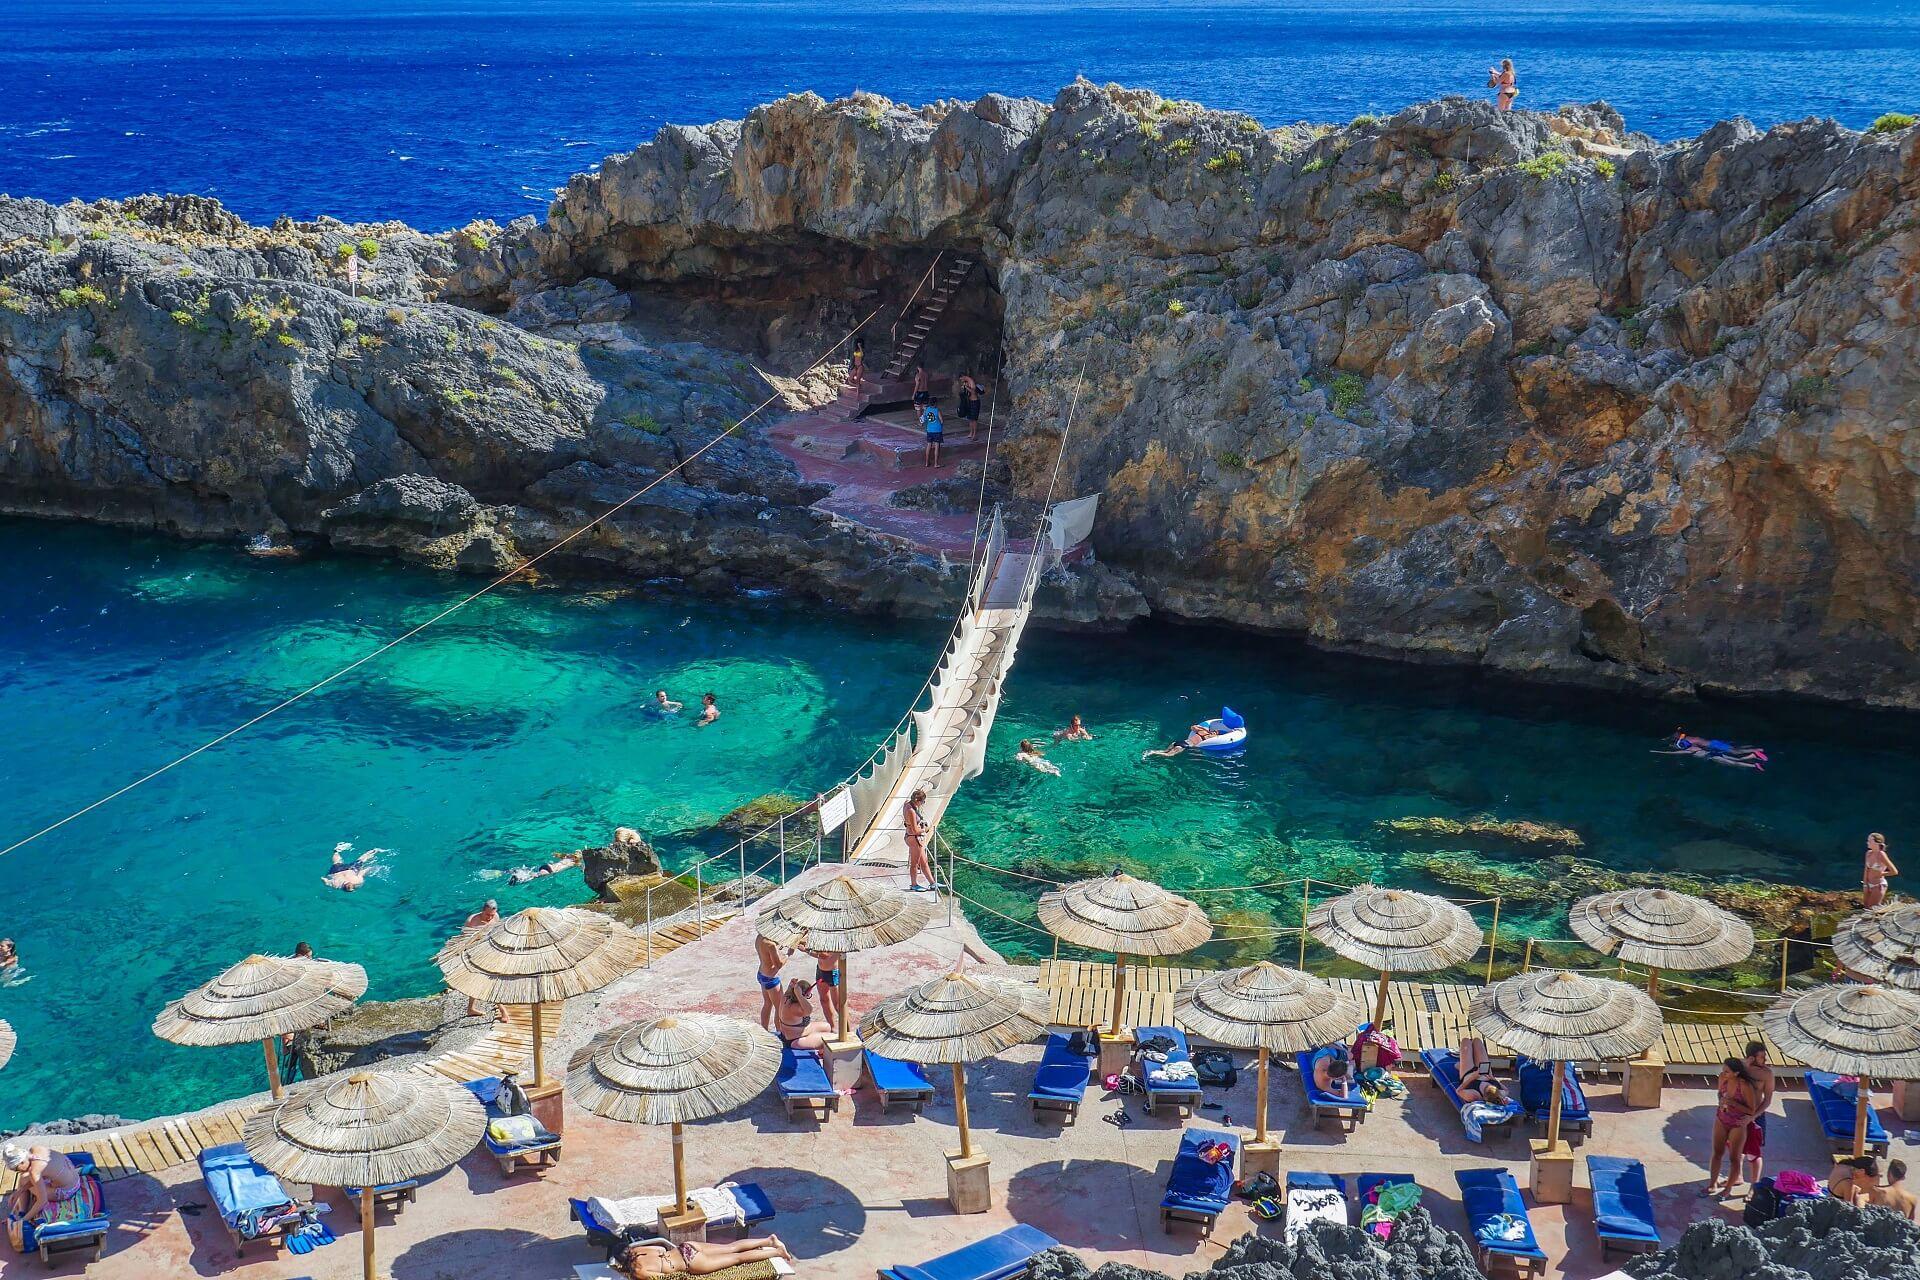 Beach Pictures With Umbrellas Resort Clip Art Clipart